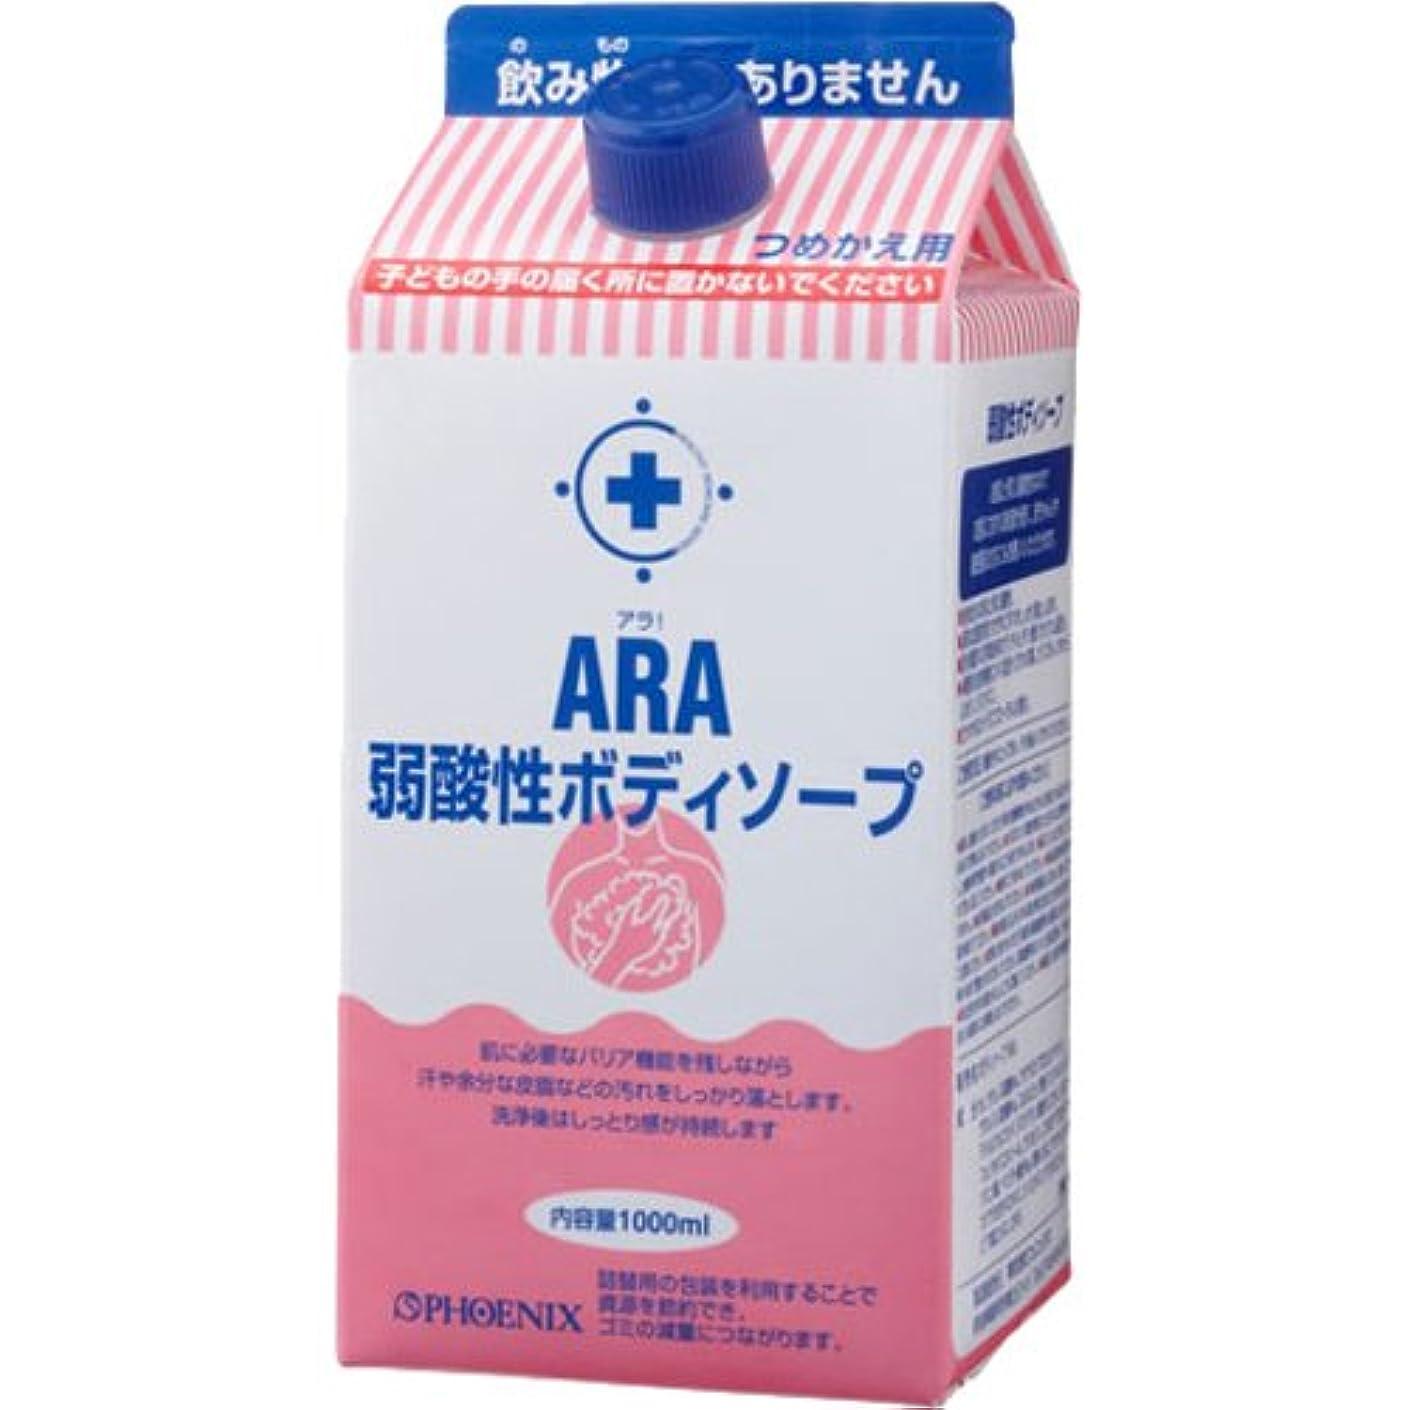 ARA 弱酸性ボディソープ (詰替え用) 1000ml×12入り